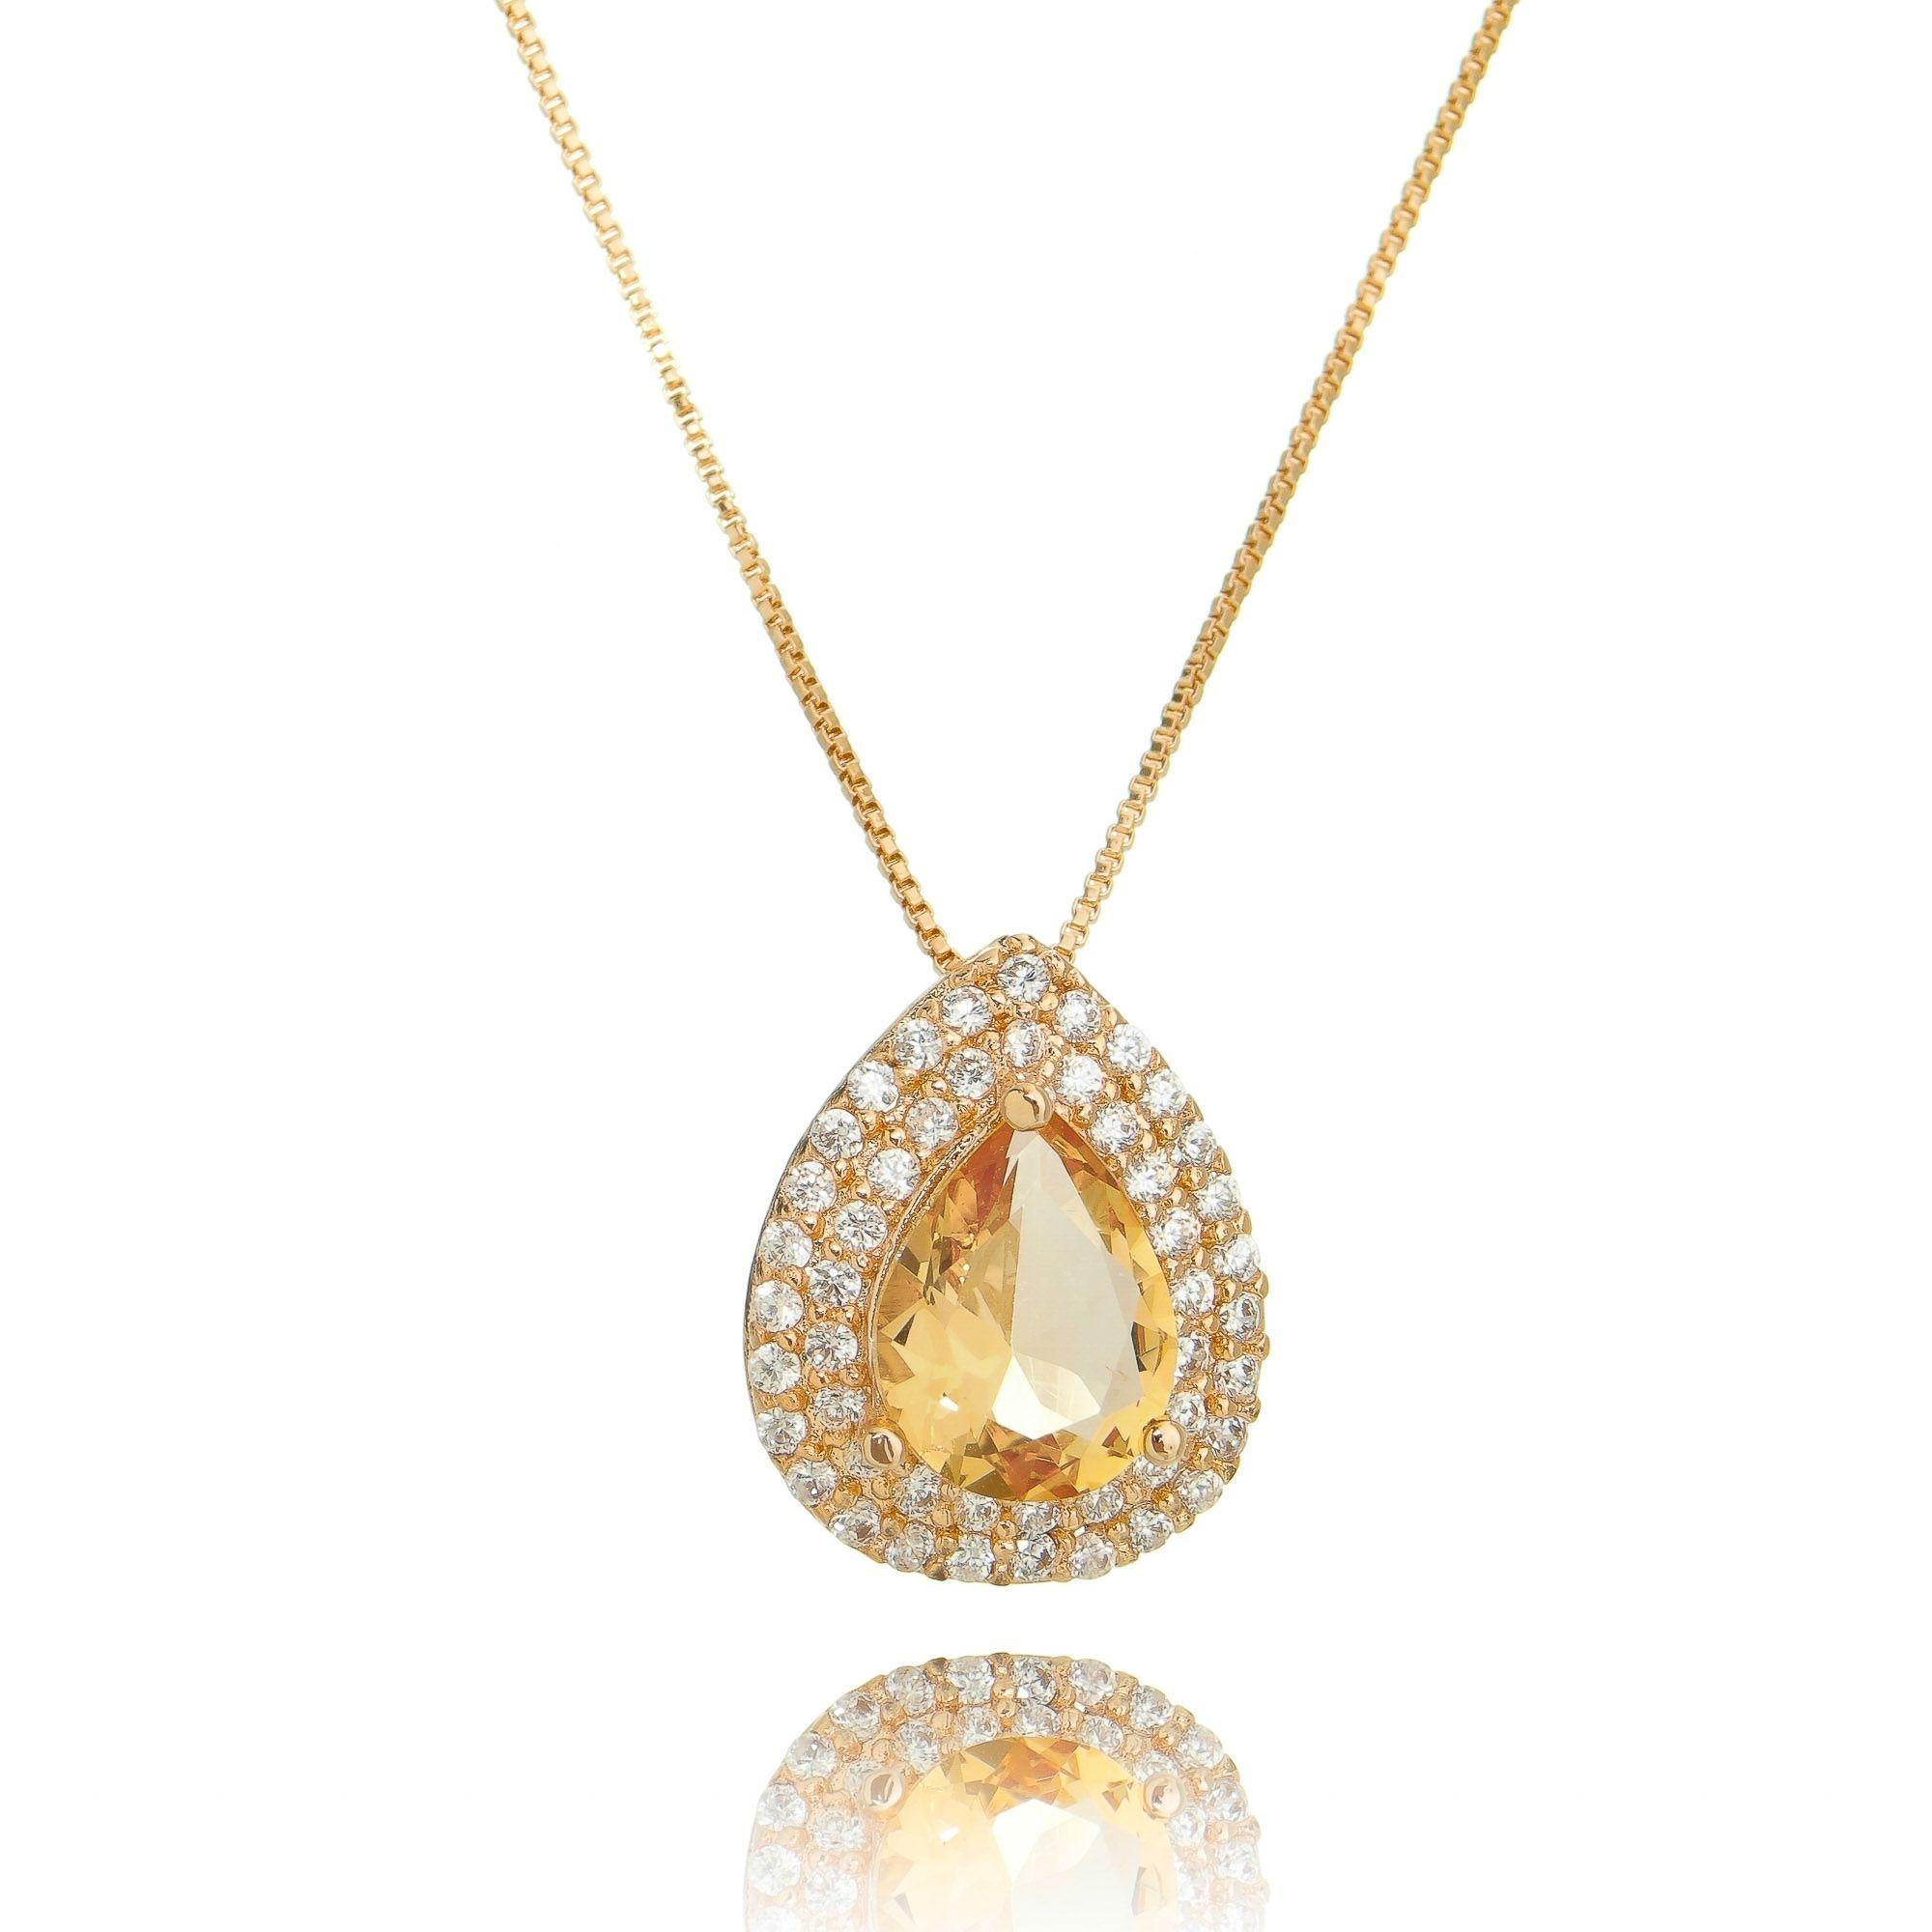 Colar Gota Morganita Ouro Rosé 2 Molduras Zircônia Cristal Semijoia  - Soloyou